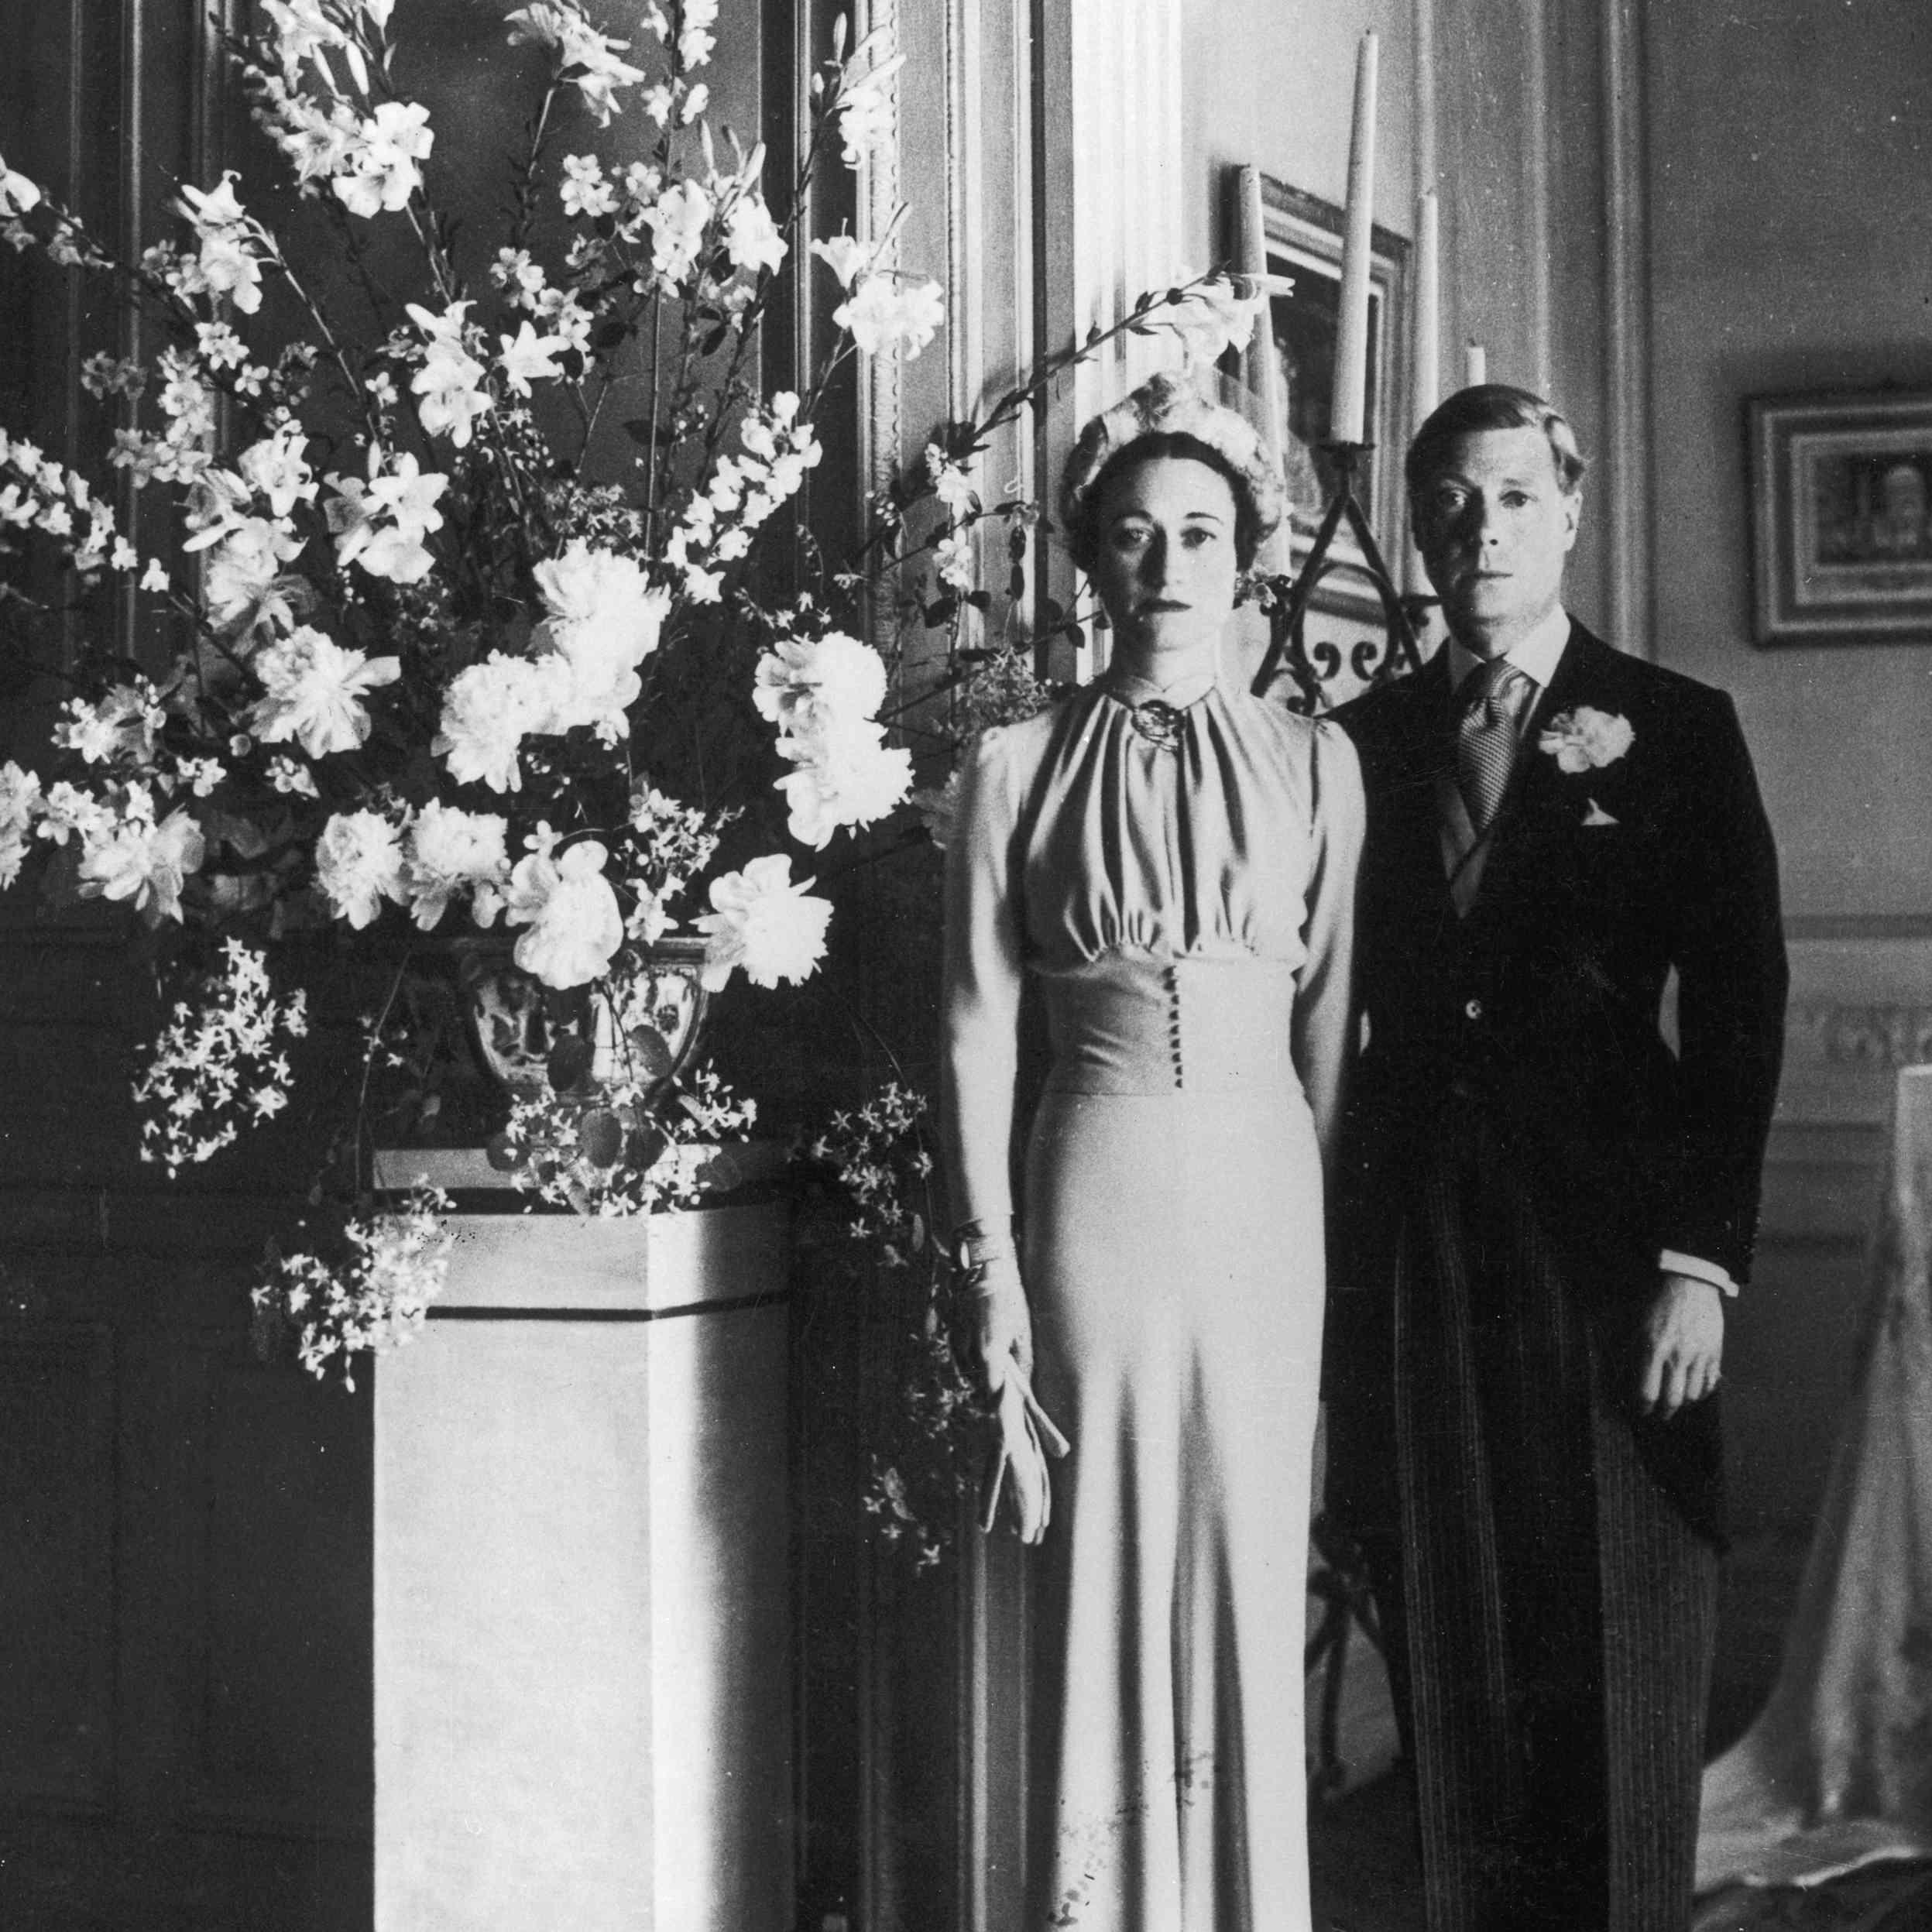 Full-length portrait of the Duke of Windsor and Wallis Warfield